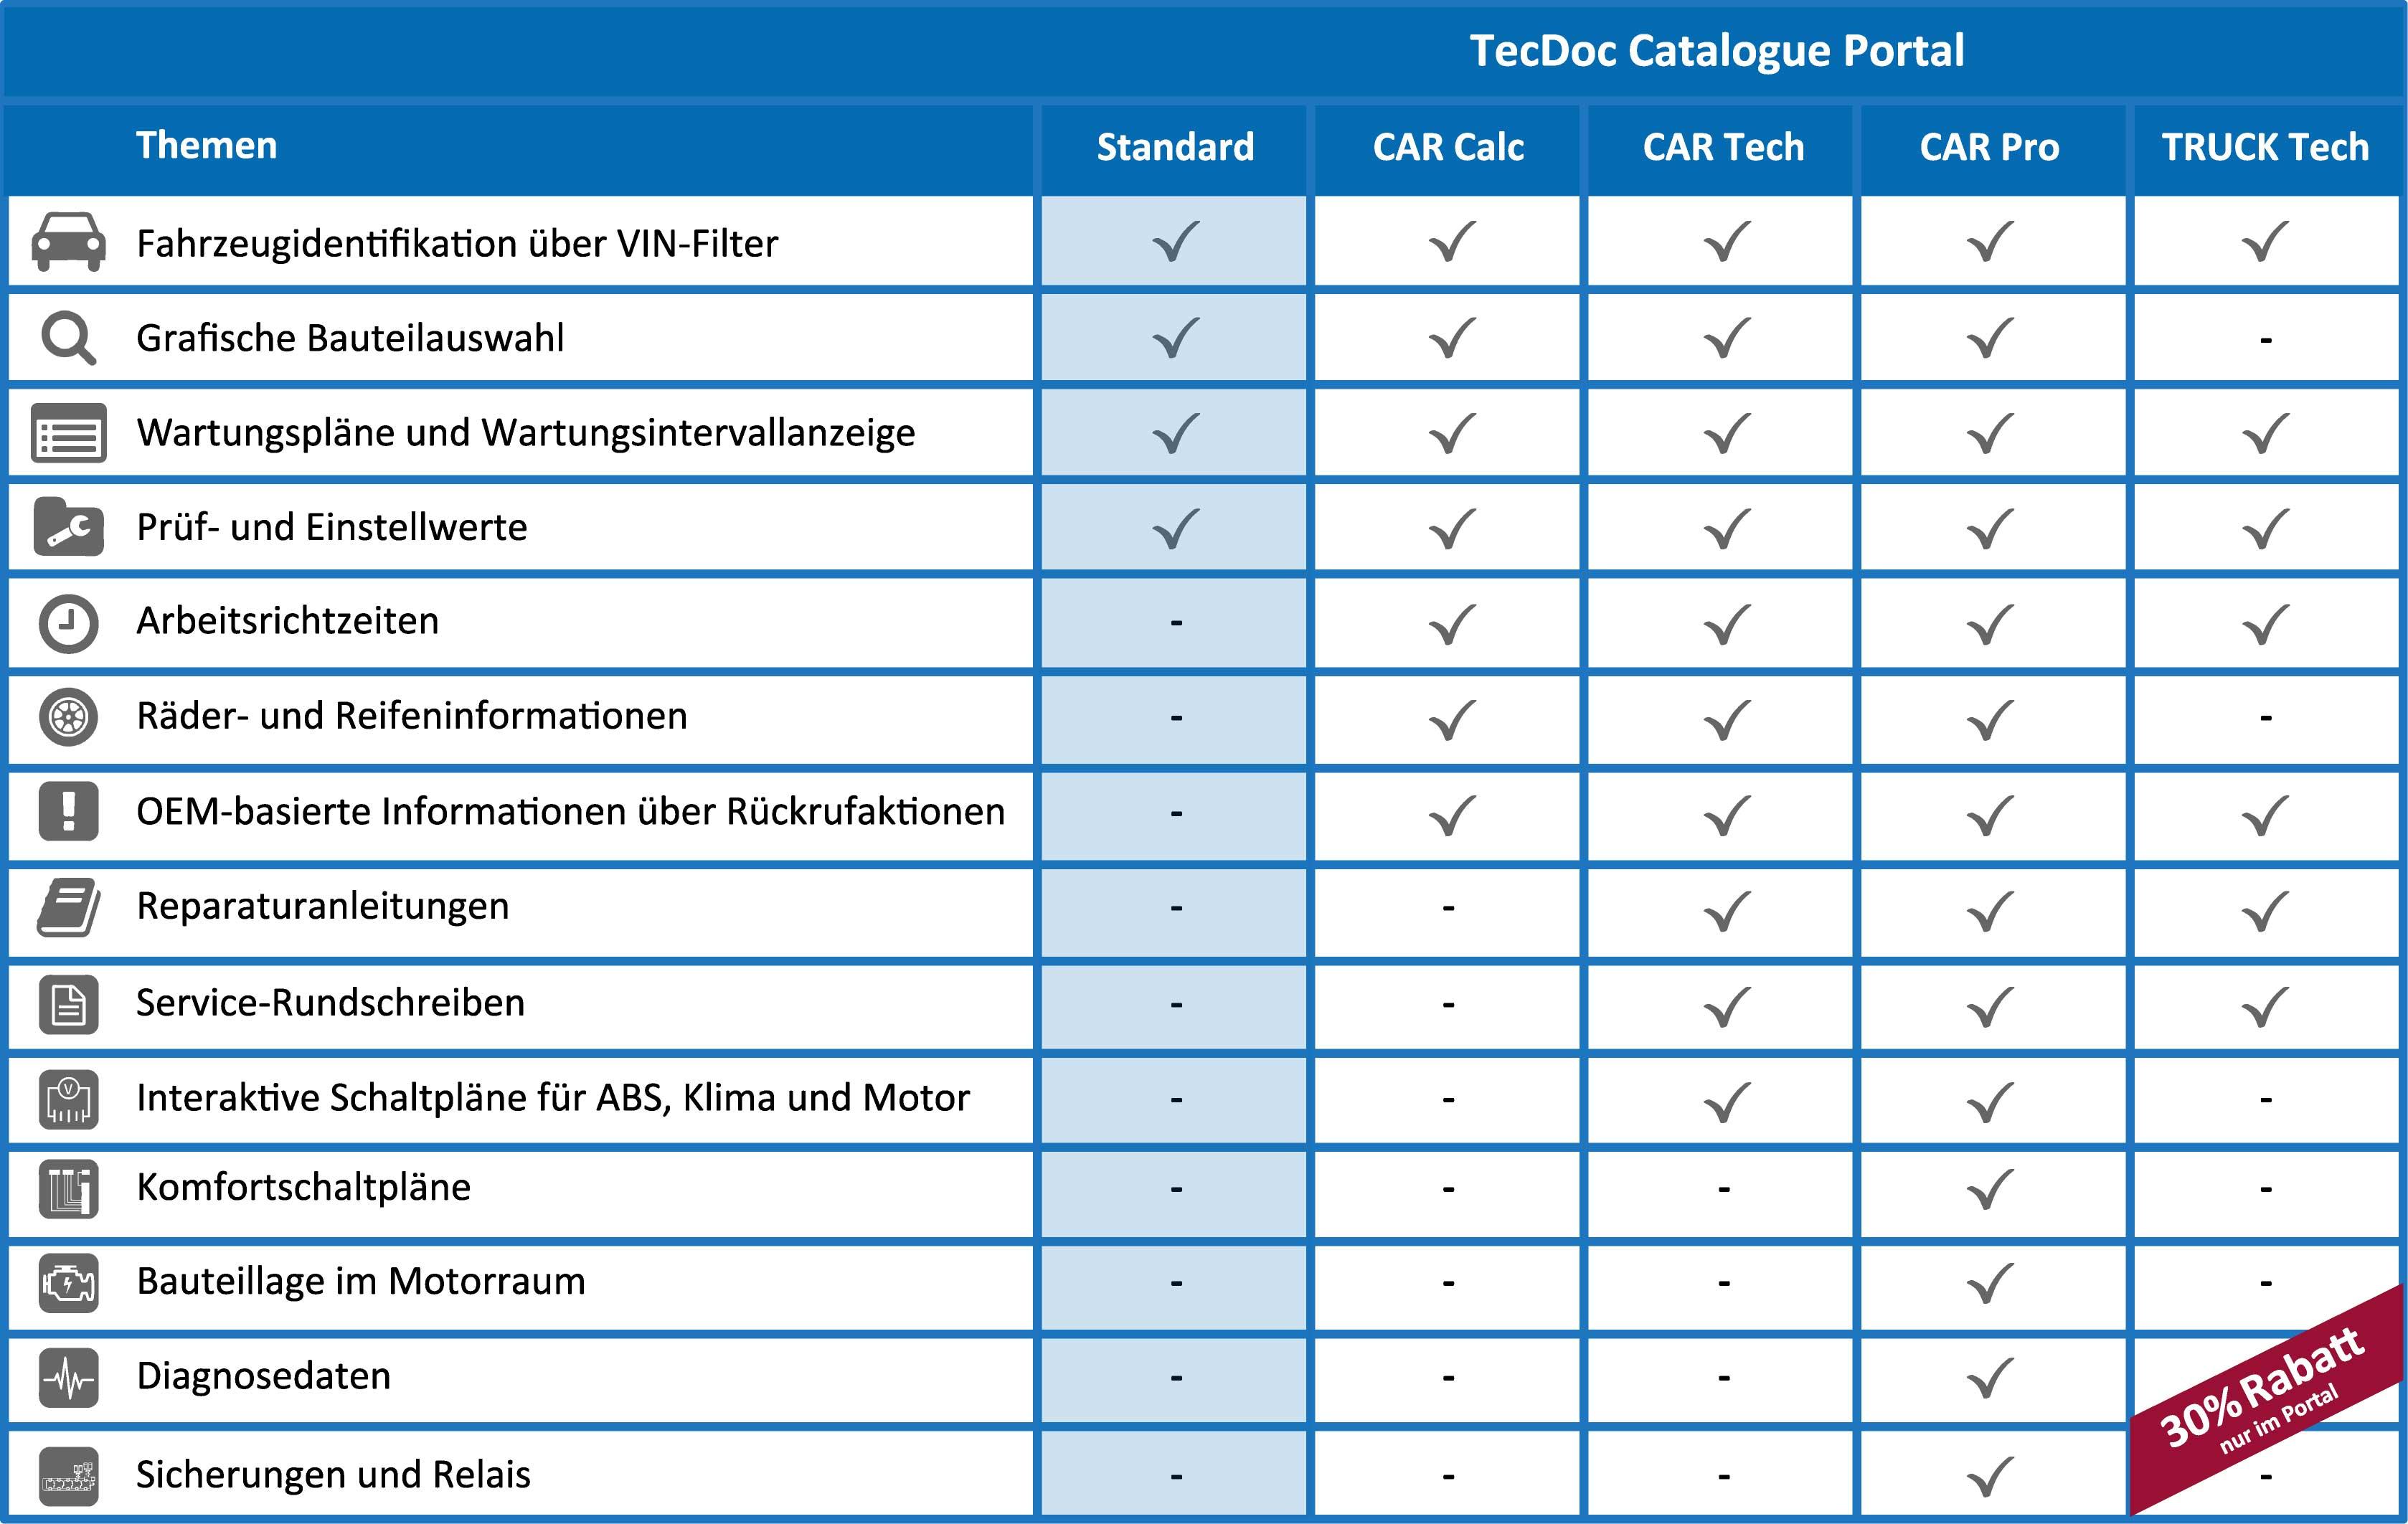 WEB-CATALOG-Standard_DE57cd744f90dac